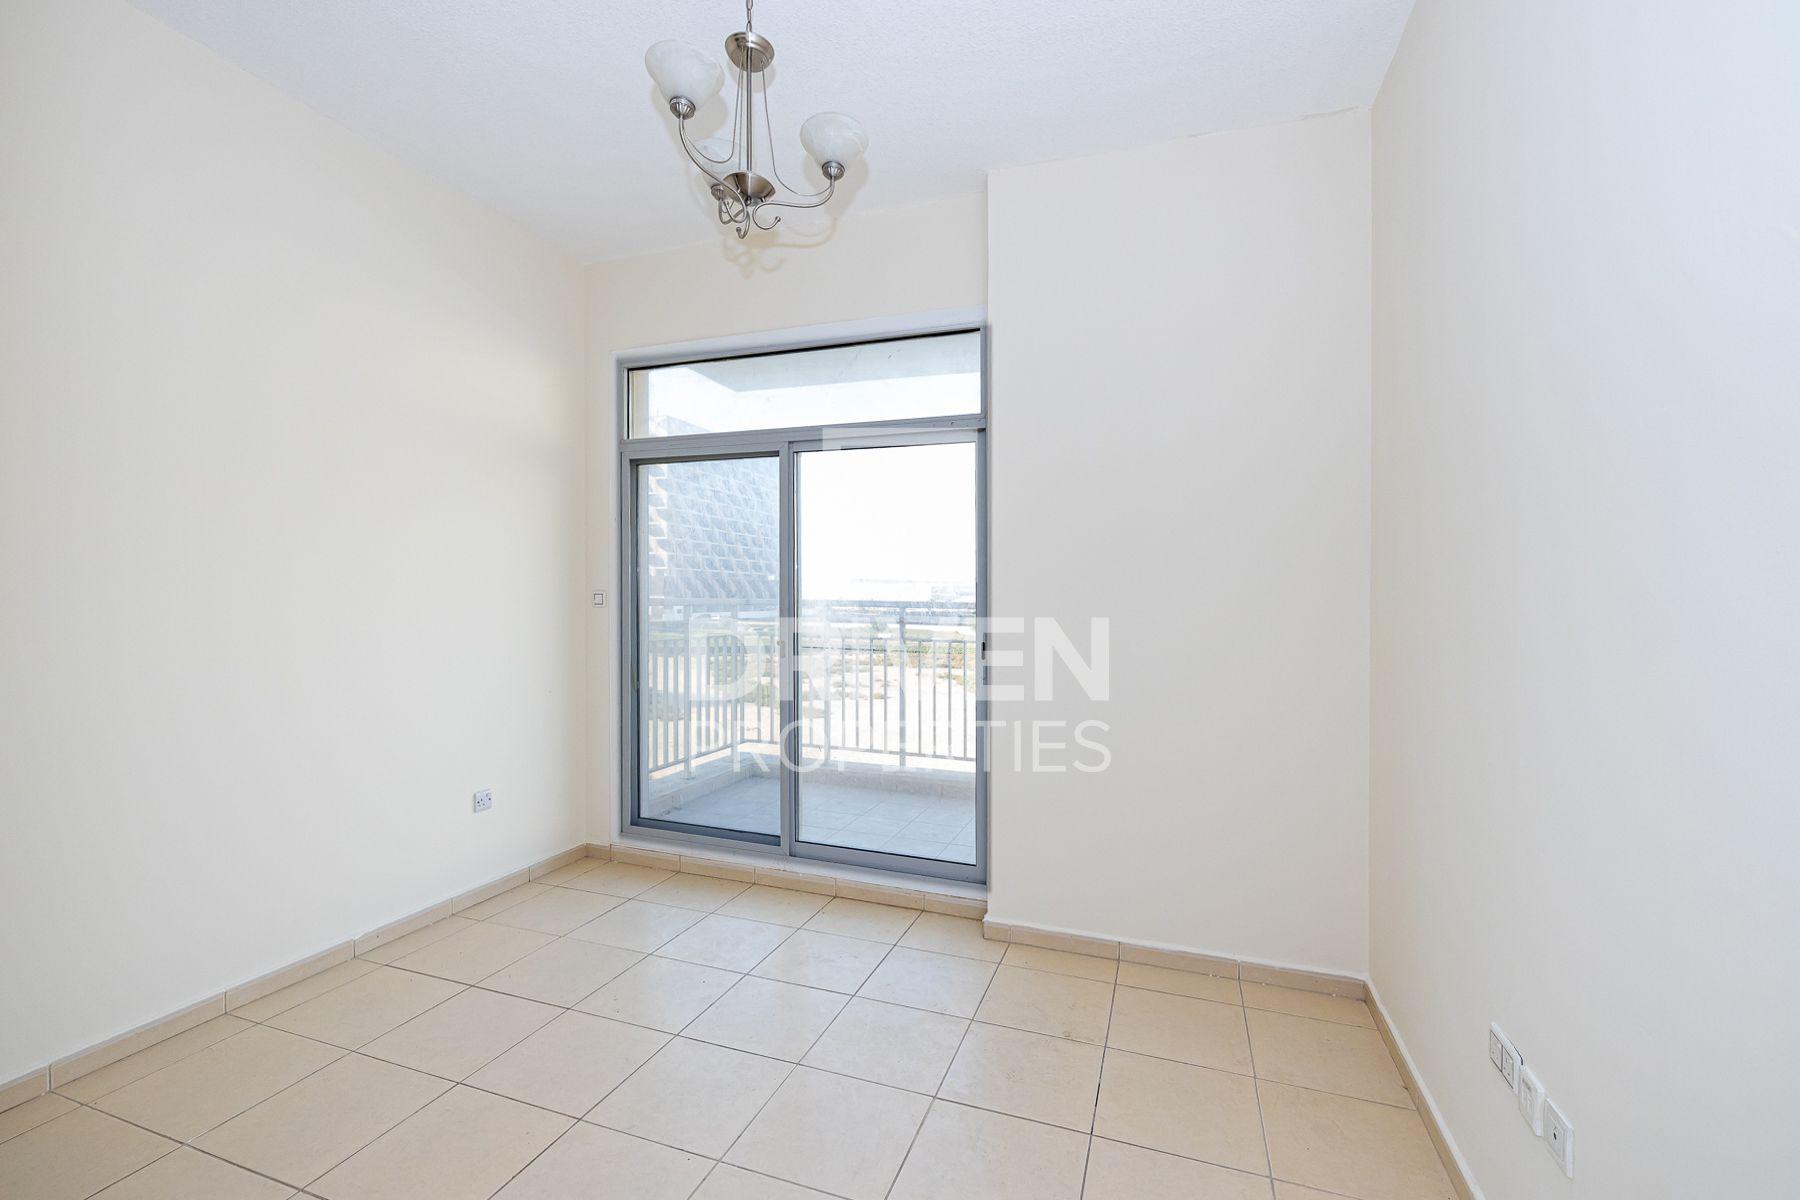 Apartment for Rent in Mazaya 9 - Dubai Land